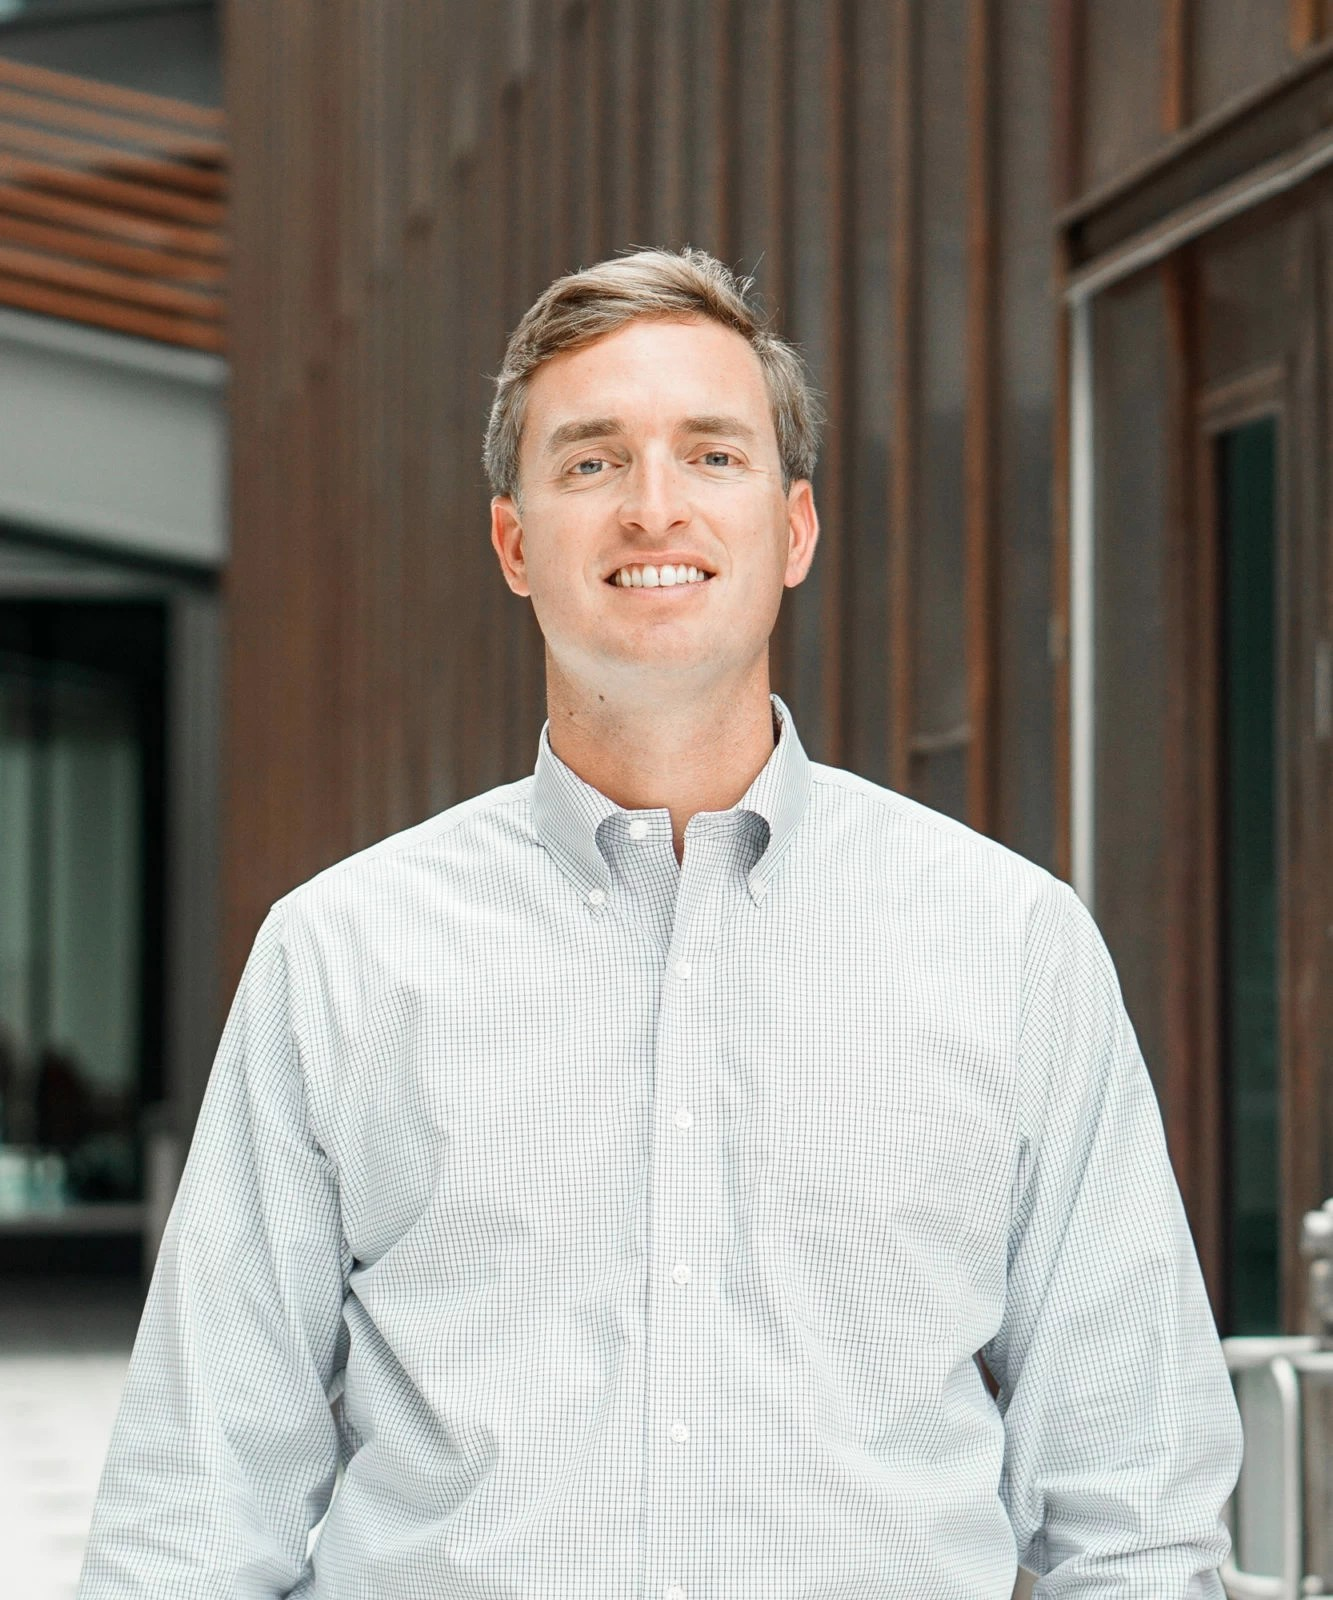 Thomas Rhodes is the CFO of Rhodes Branding